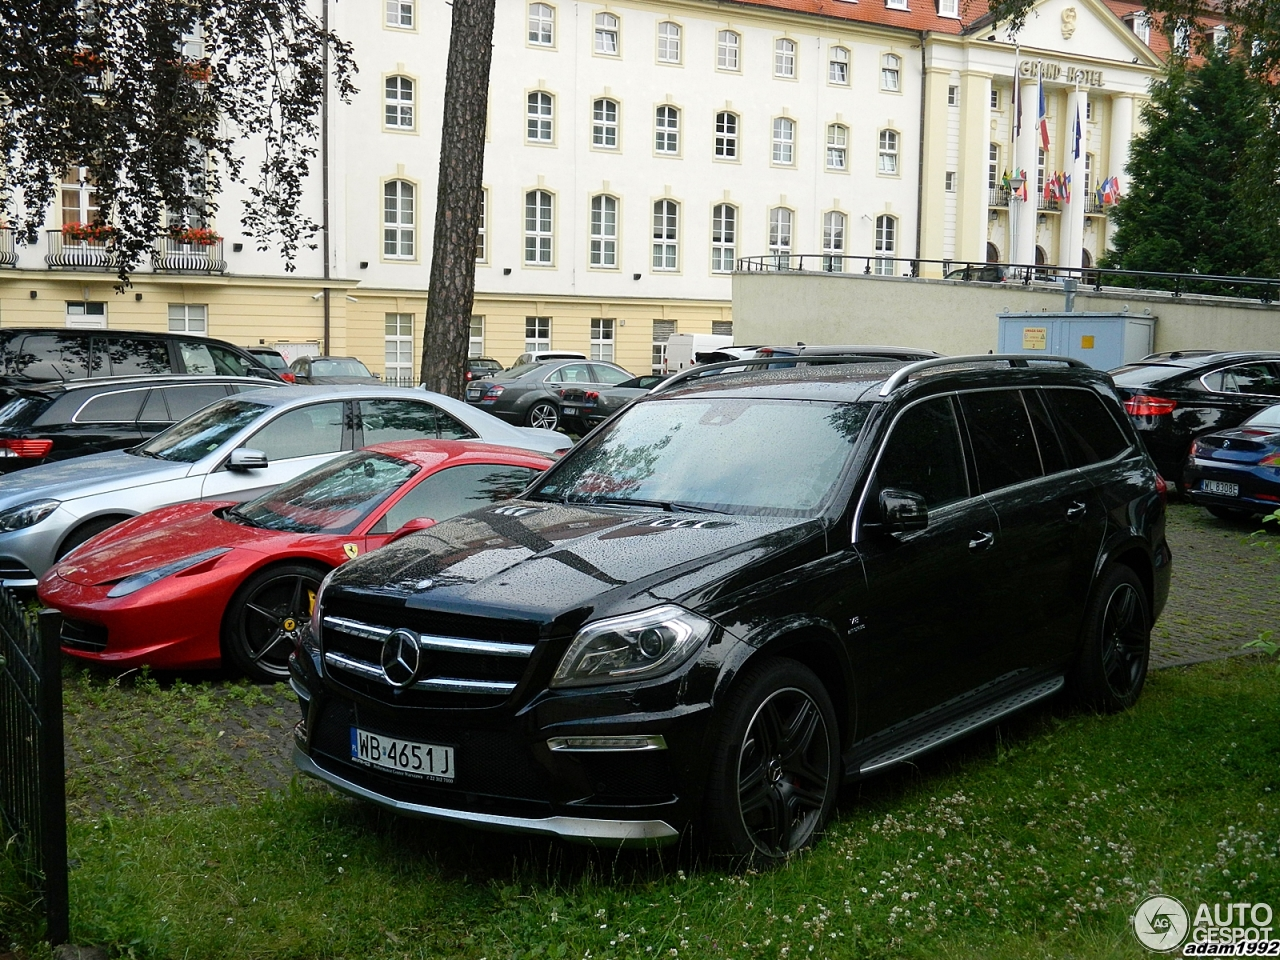 Mercedes benz gl 63 amg x166 9 july 2014 autogespot for Mercedes benz gls 2014